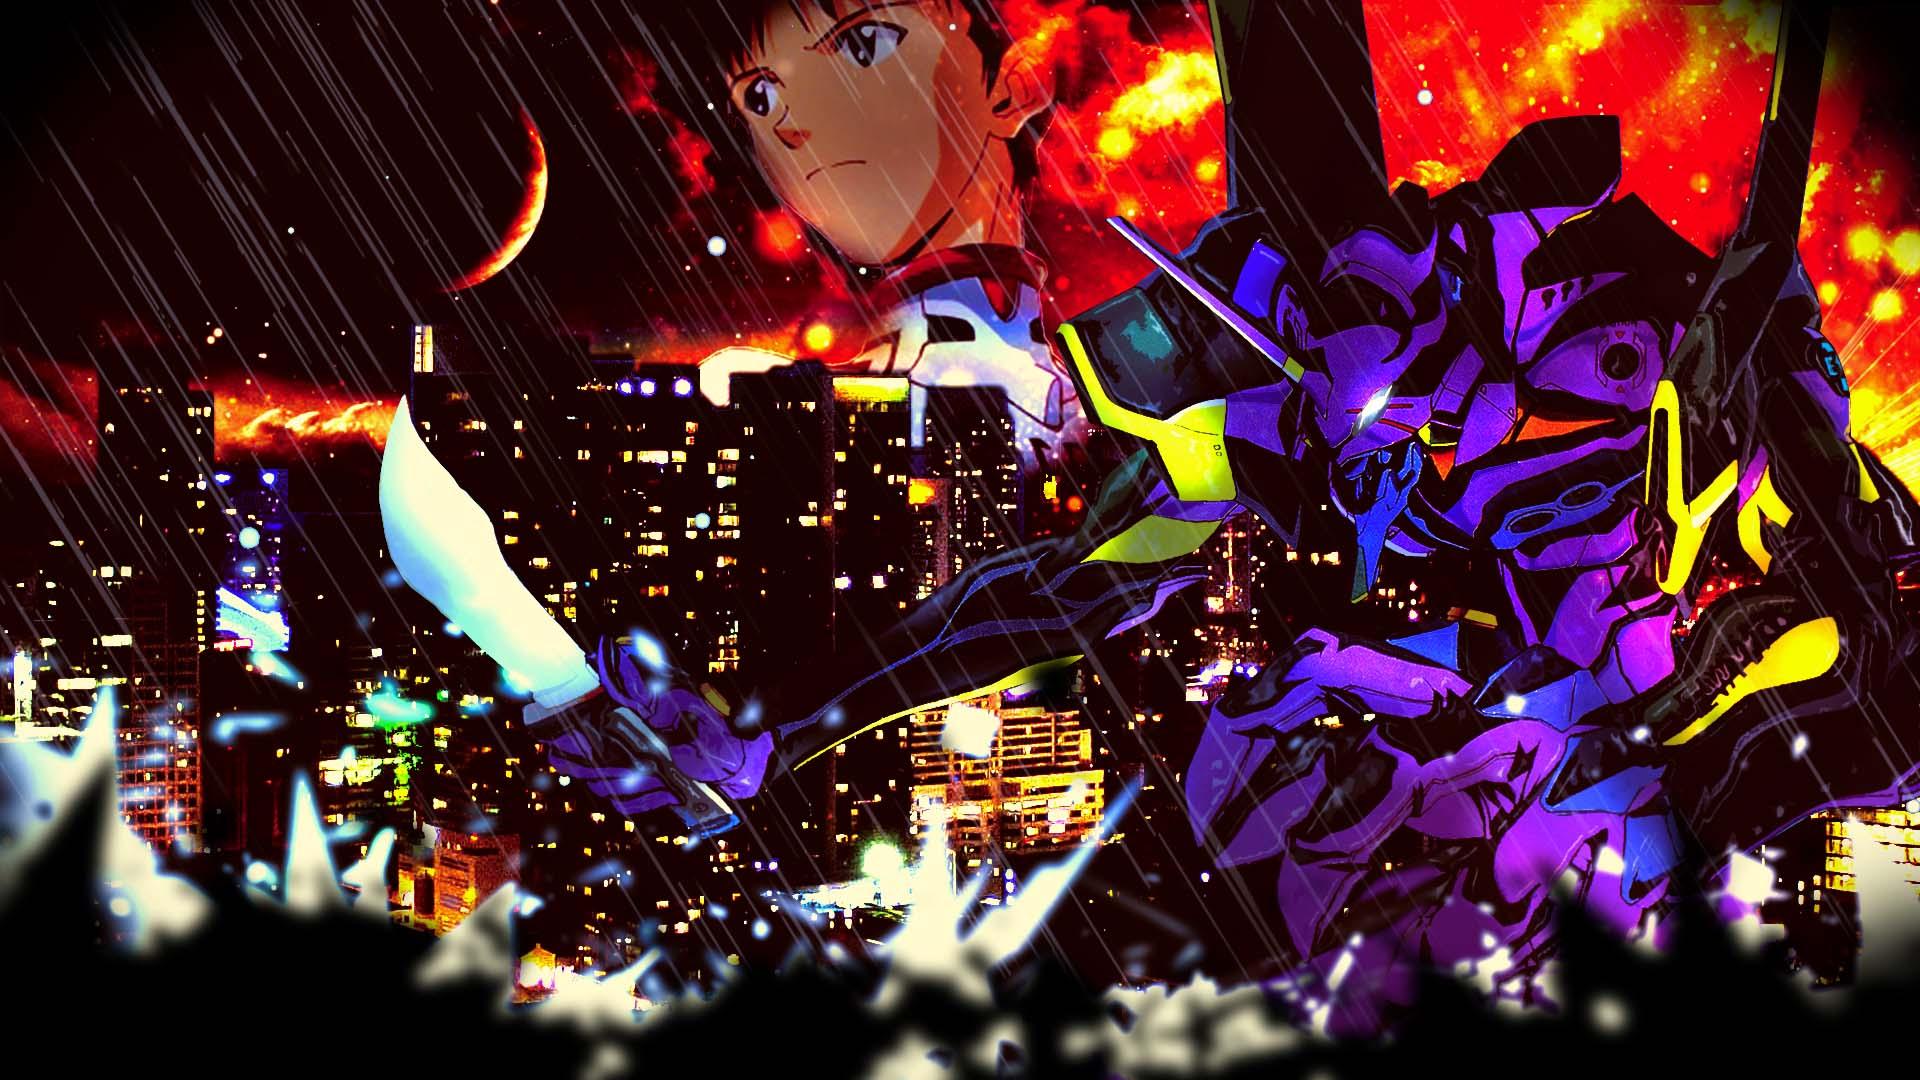 eva unit 01 - neon genesis evangelion wallpapershojizenshin on